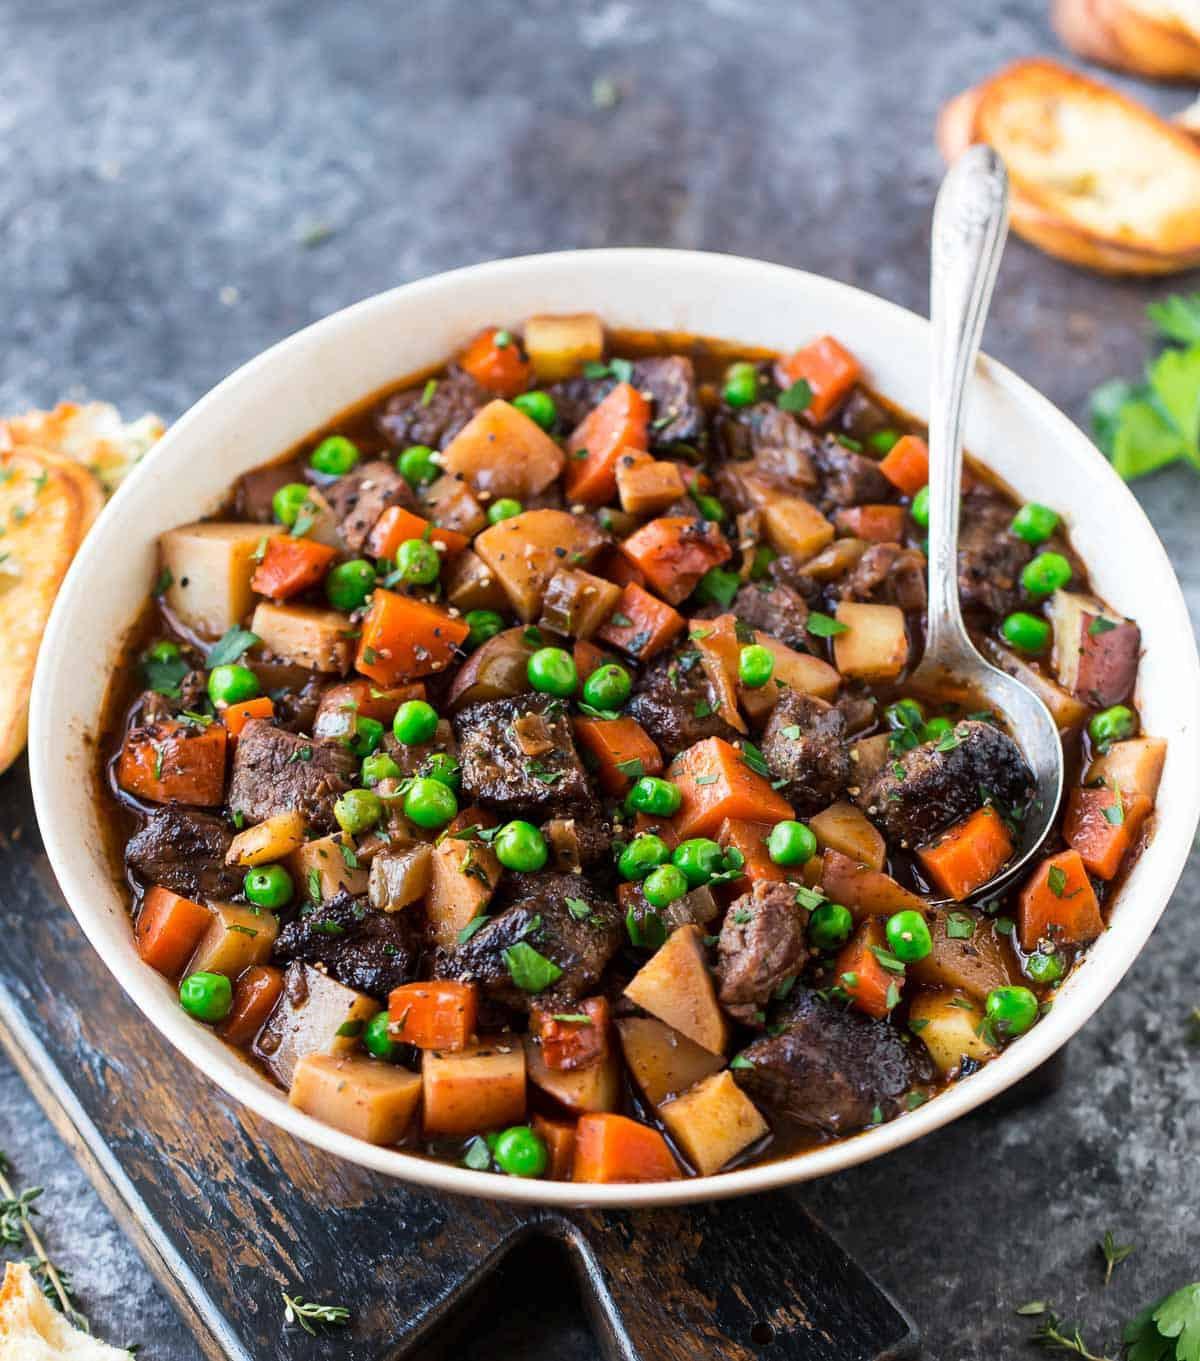 Beef Stew Crock Pot Recipes  Crock Pot Beef Stew Recipe